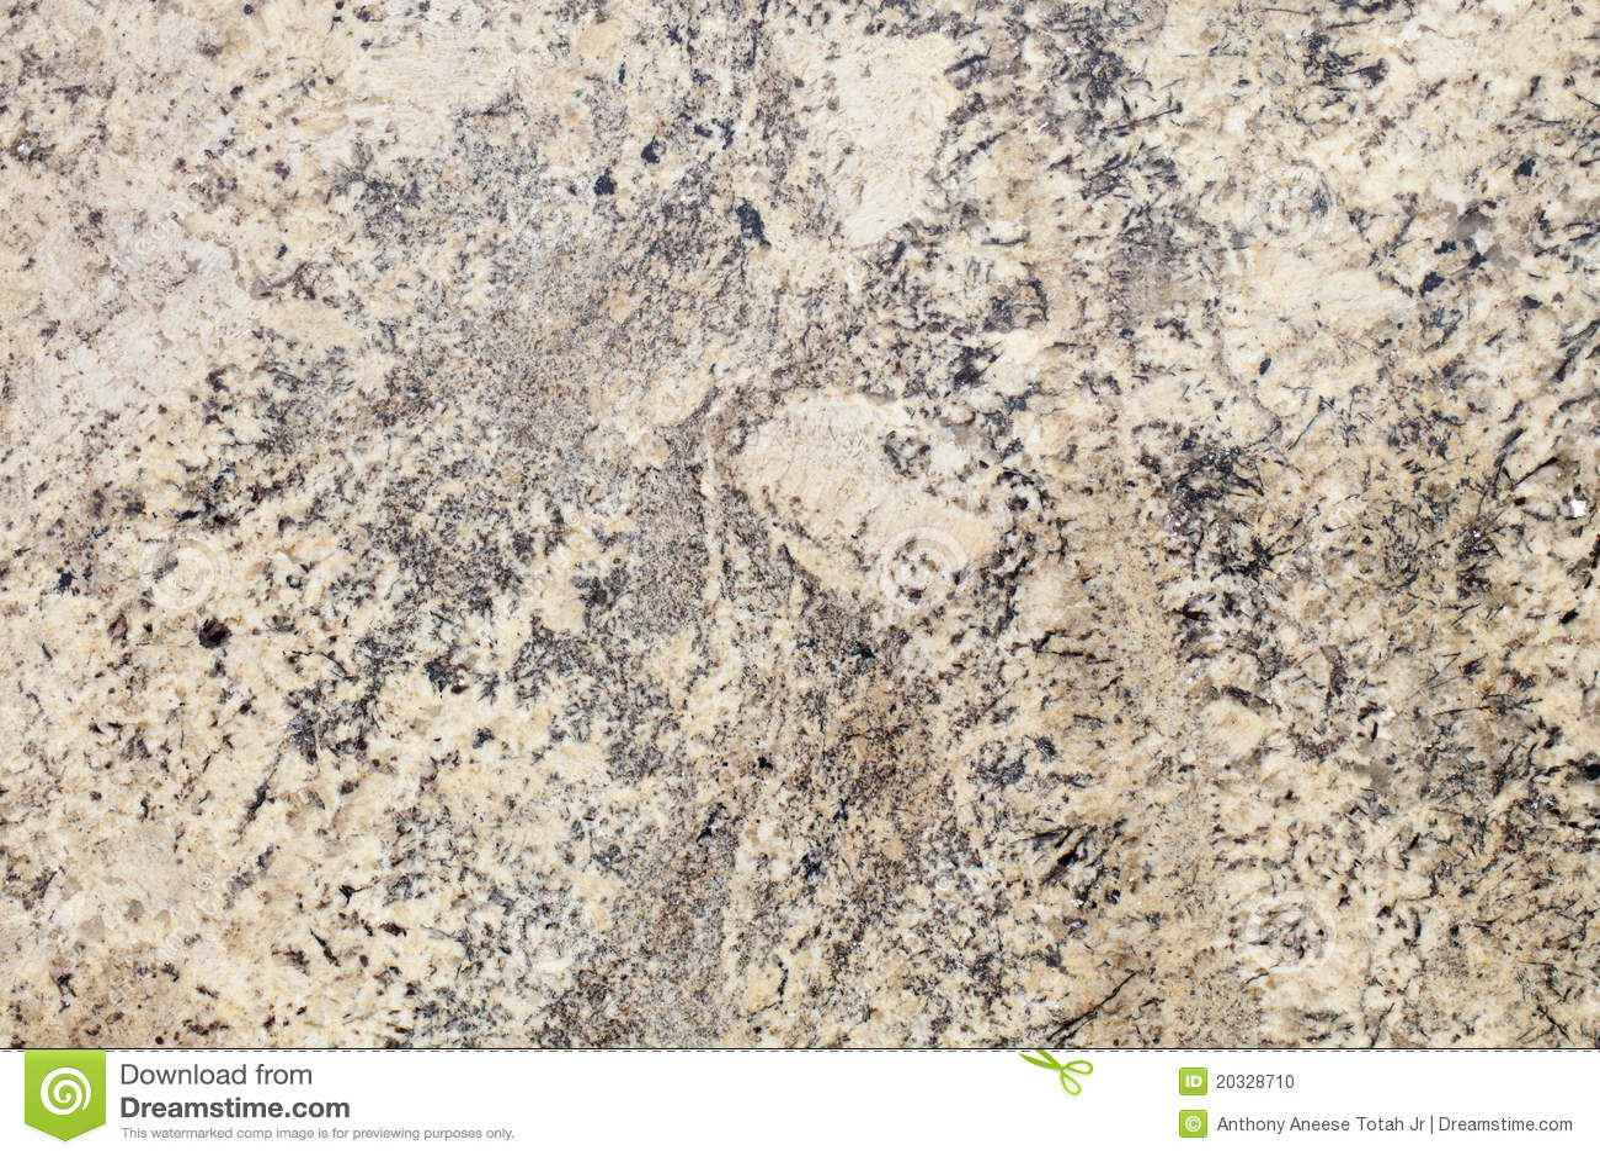 Download Absolute Cream Granite Stock Photo Image Of Material